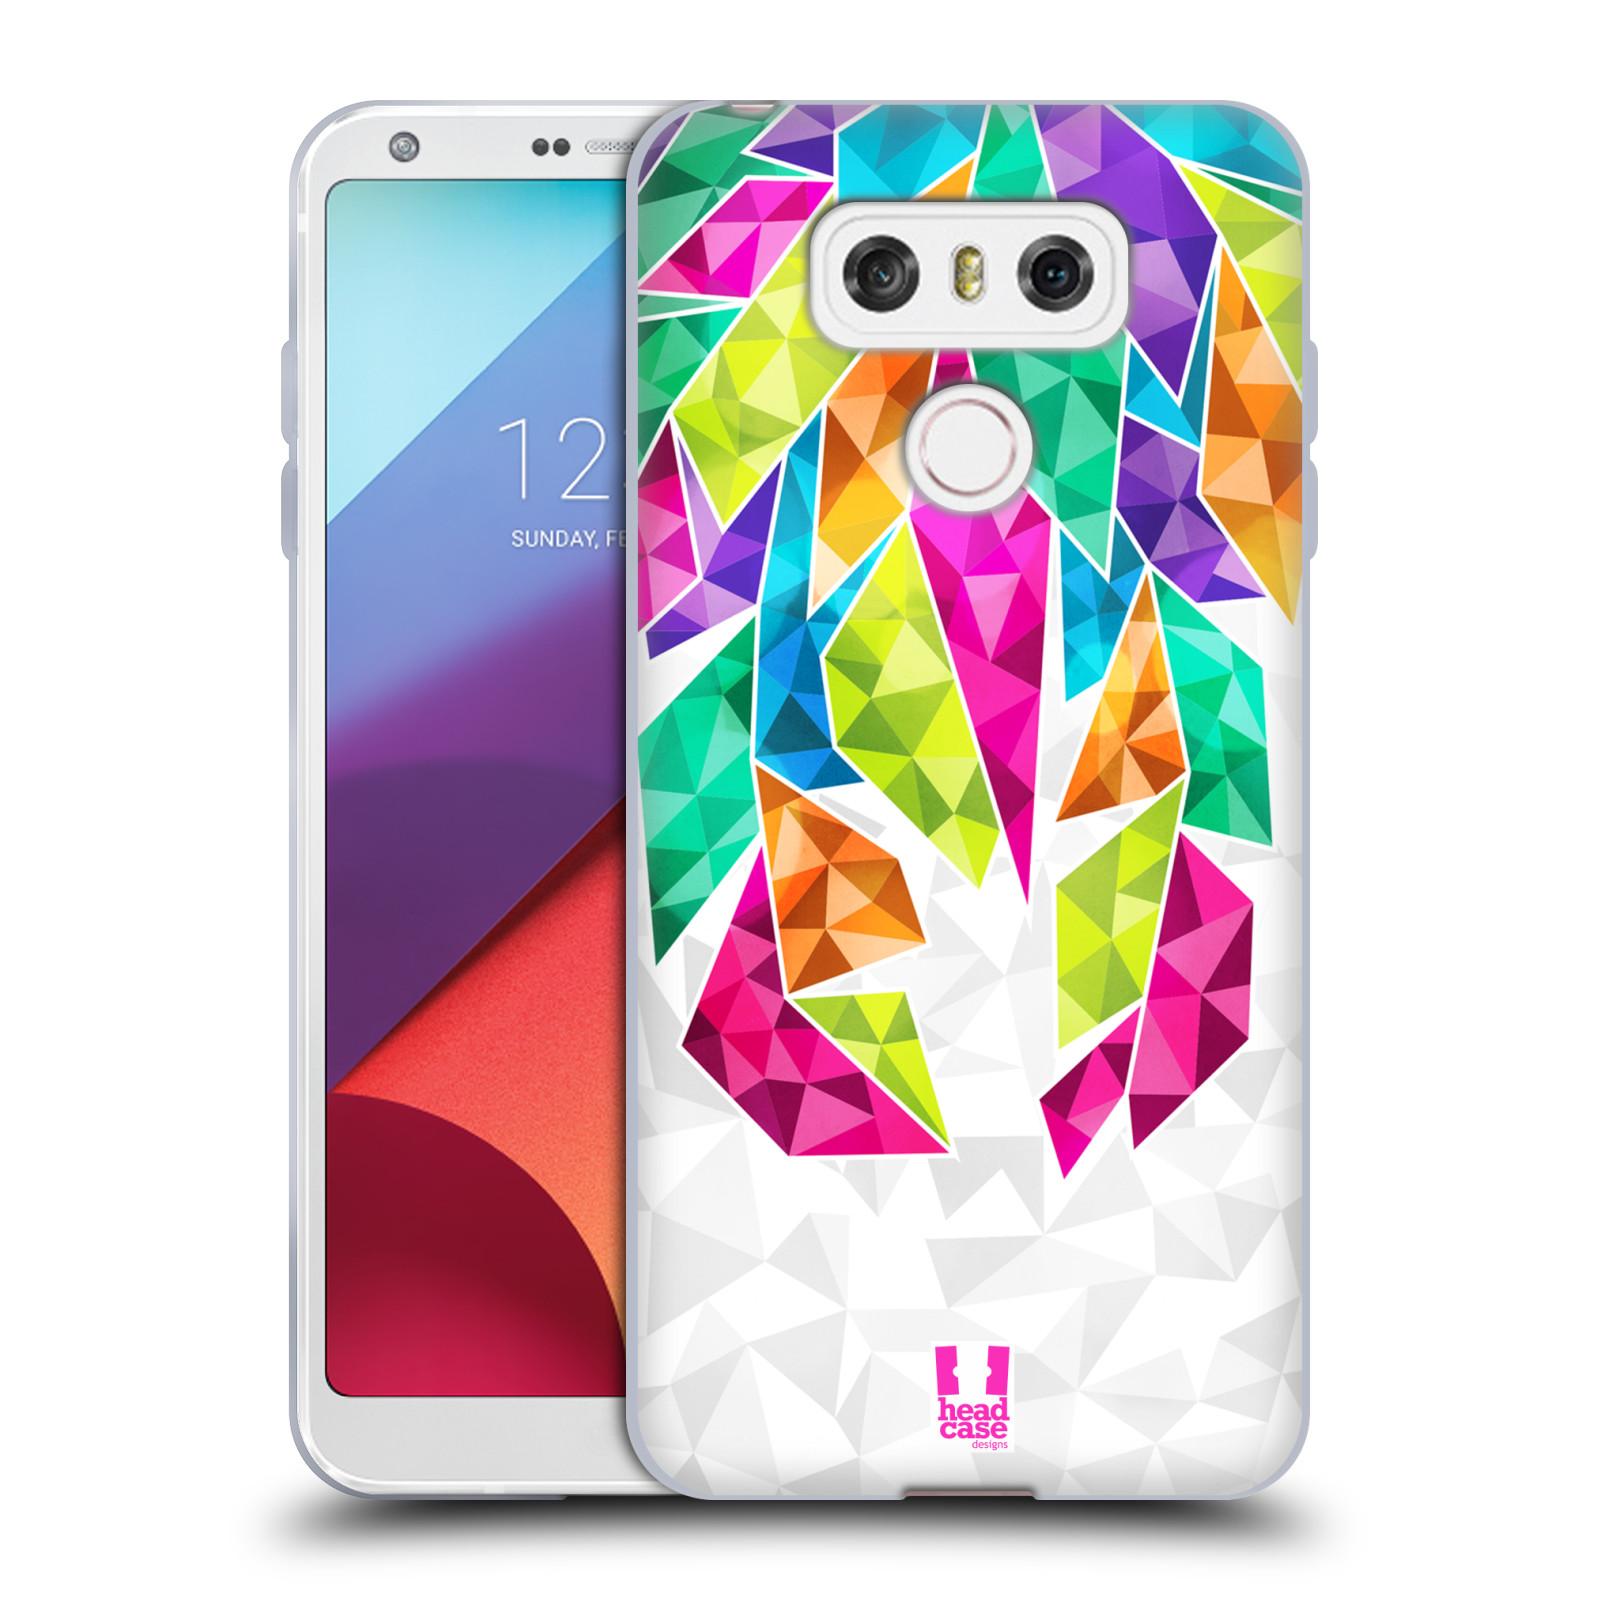 Silikonové pouzdro na mobil LG G6 - Head Case PÍRKA TICKLE (Silikonový kryt či obal na mobilní telefon LG G6 H870 / LG G6 Dual SIM H870DS)